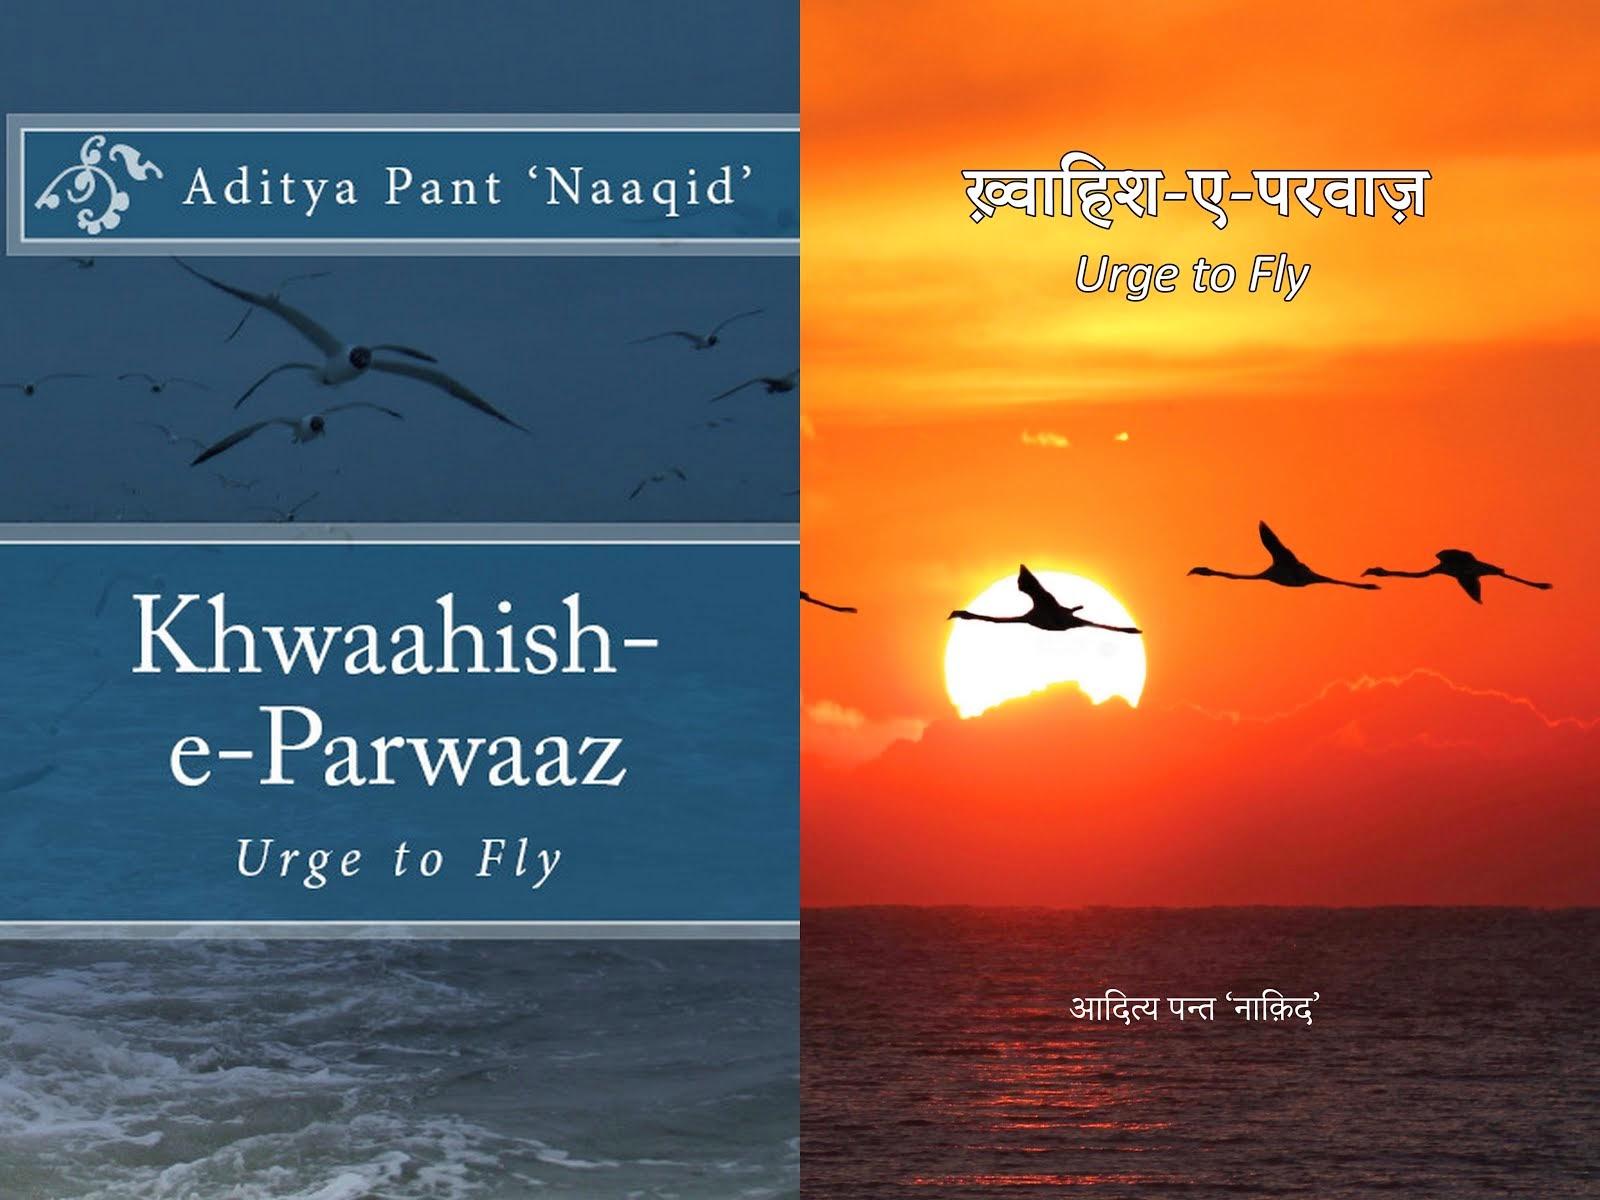 Khwaahish-e-Parwaaz